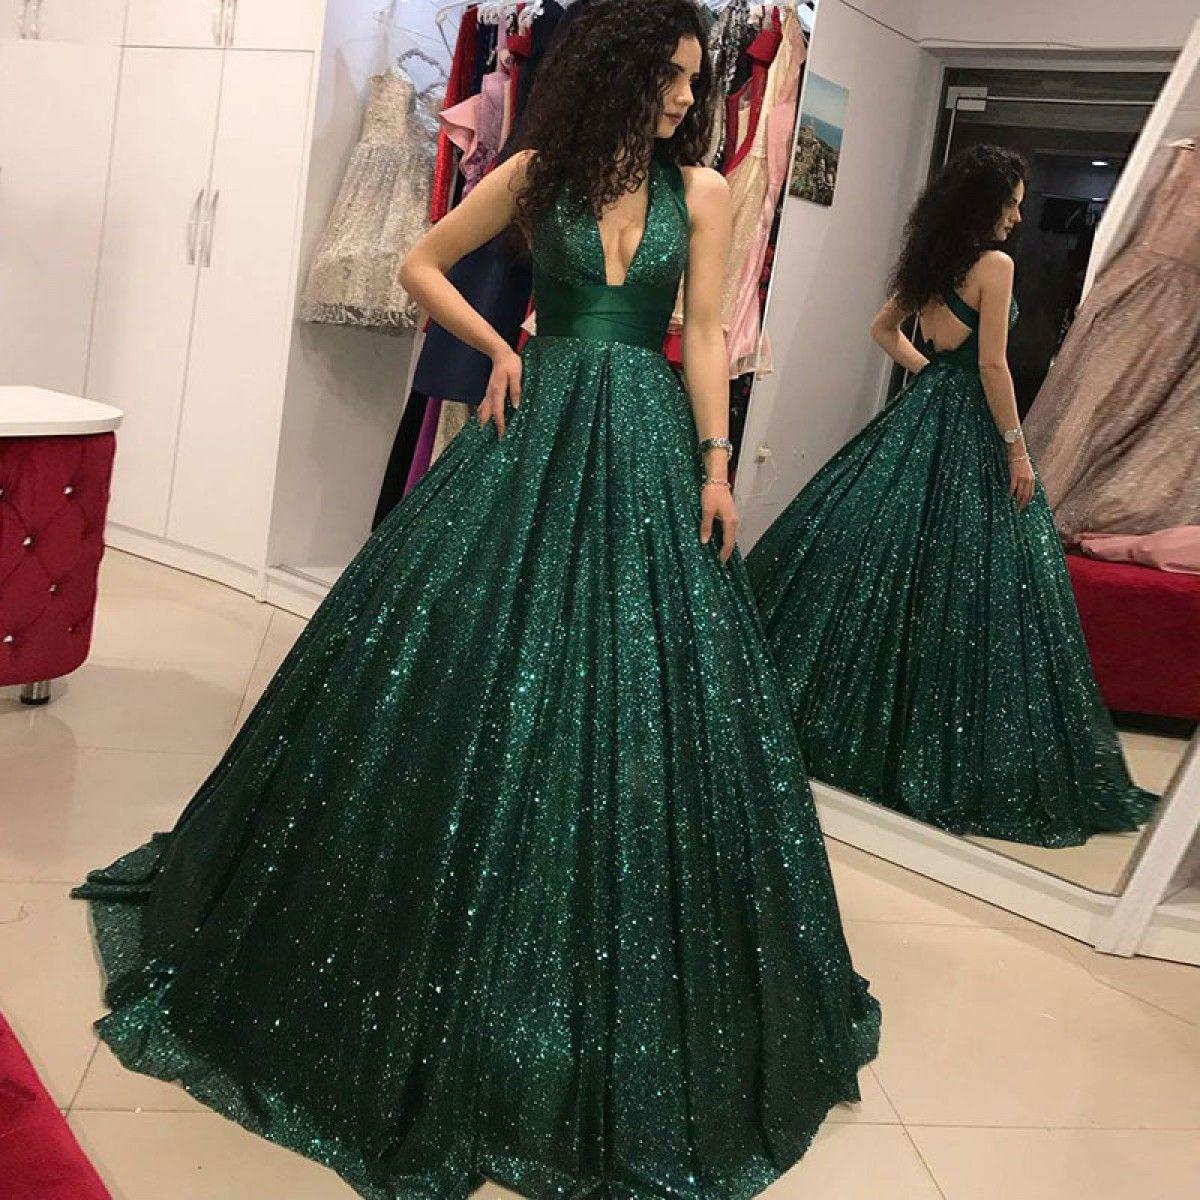 Aline vneck open back dark green sequin prom dresses graduation